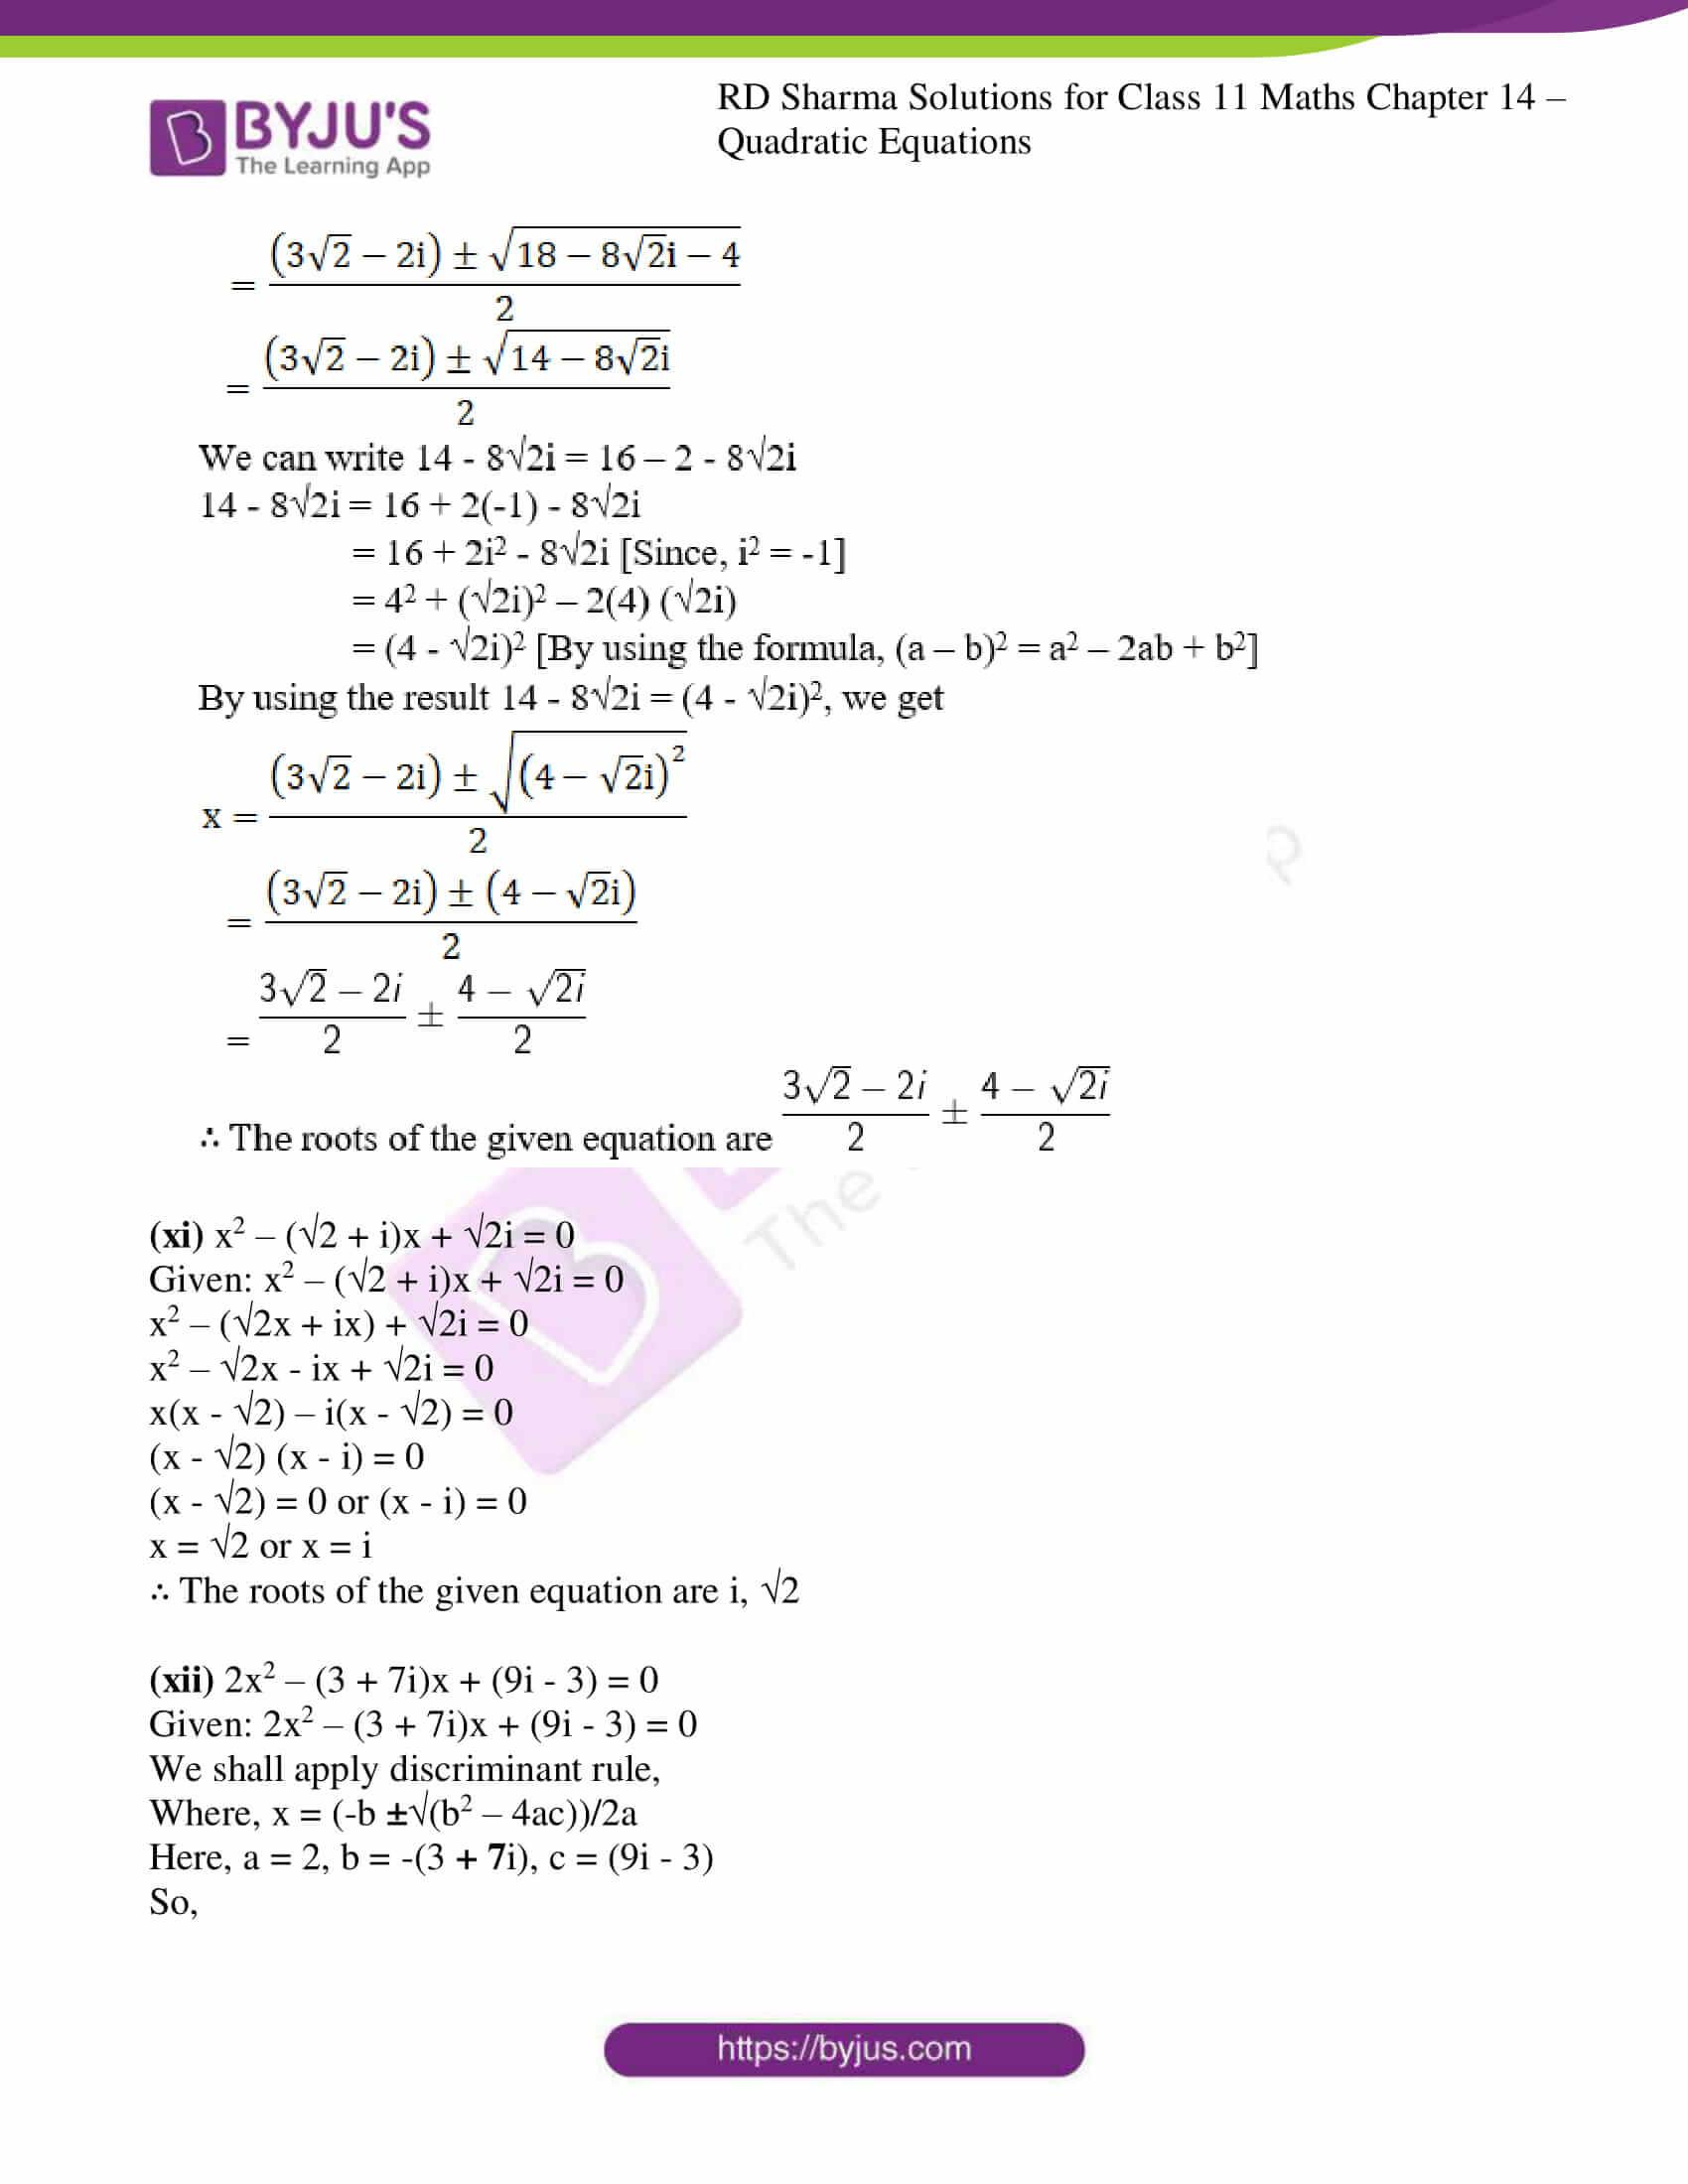 rd sharma class 11 maths ch 14 ex 2 12